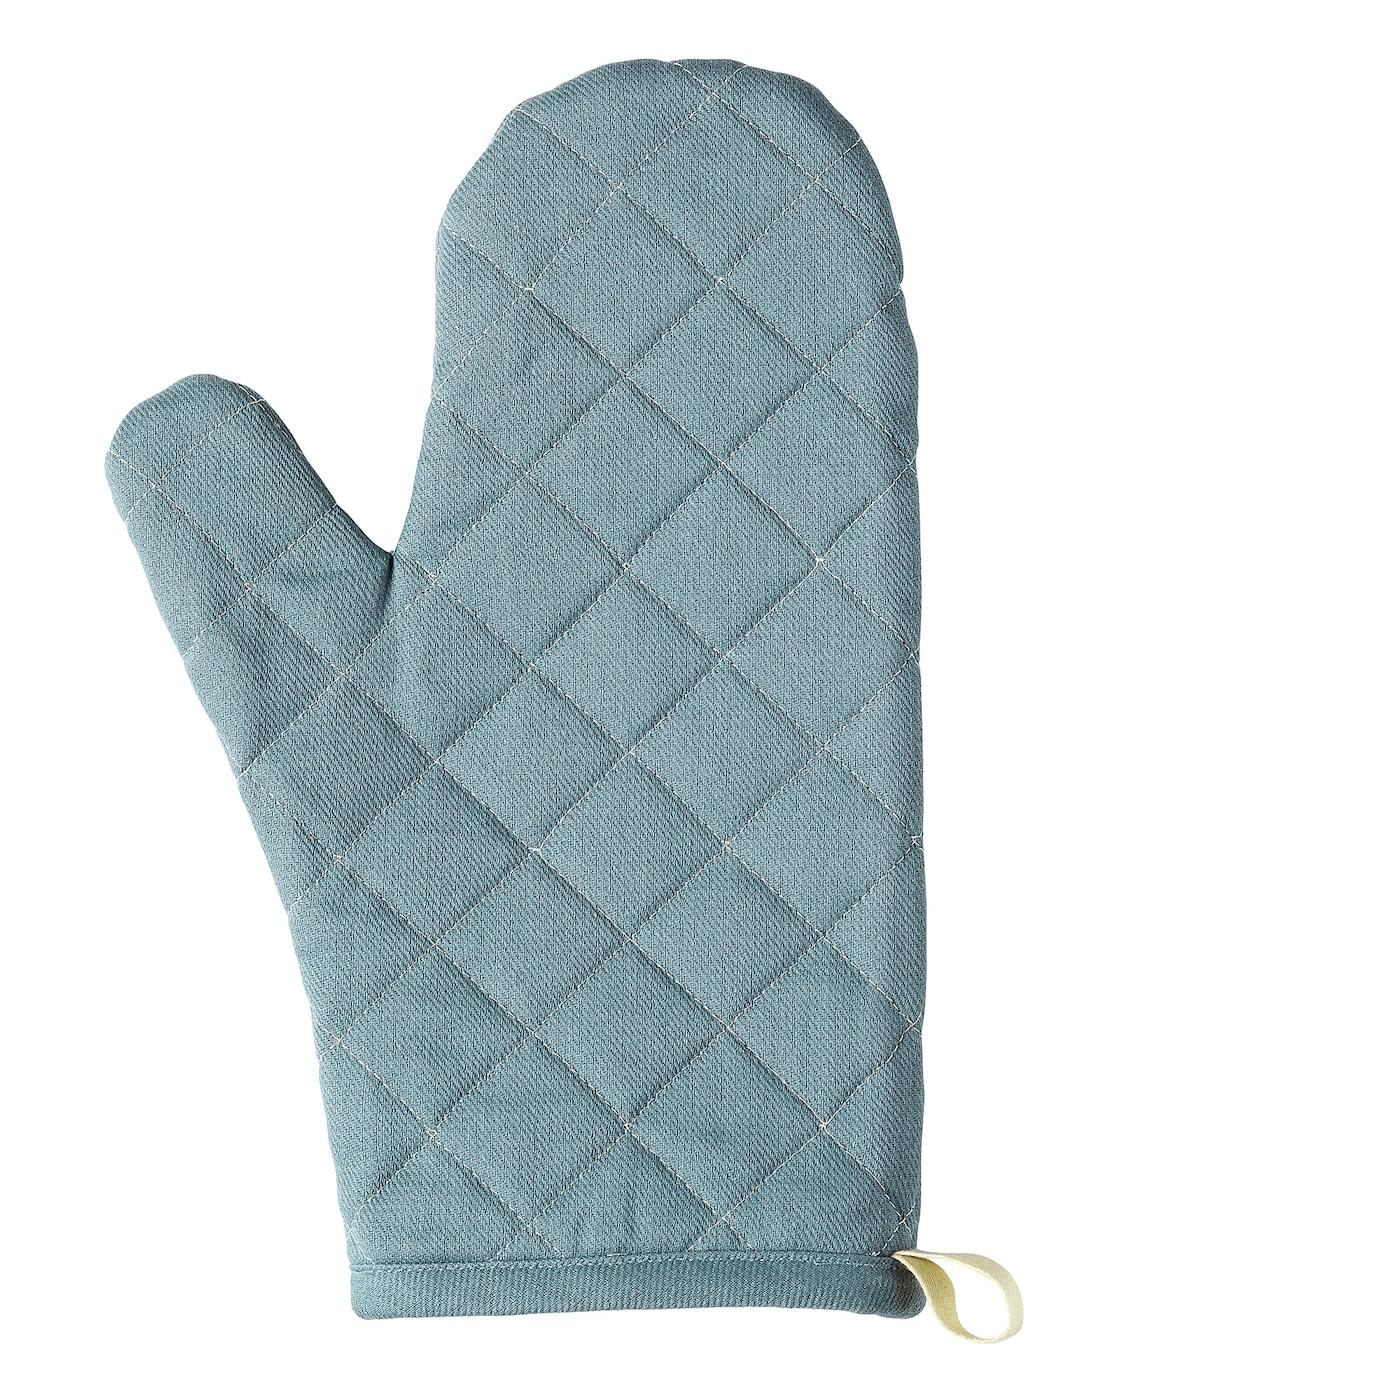 SANDVIVA Oven glove - textile/blue